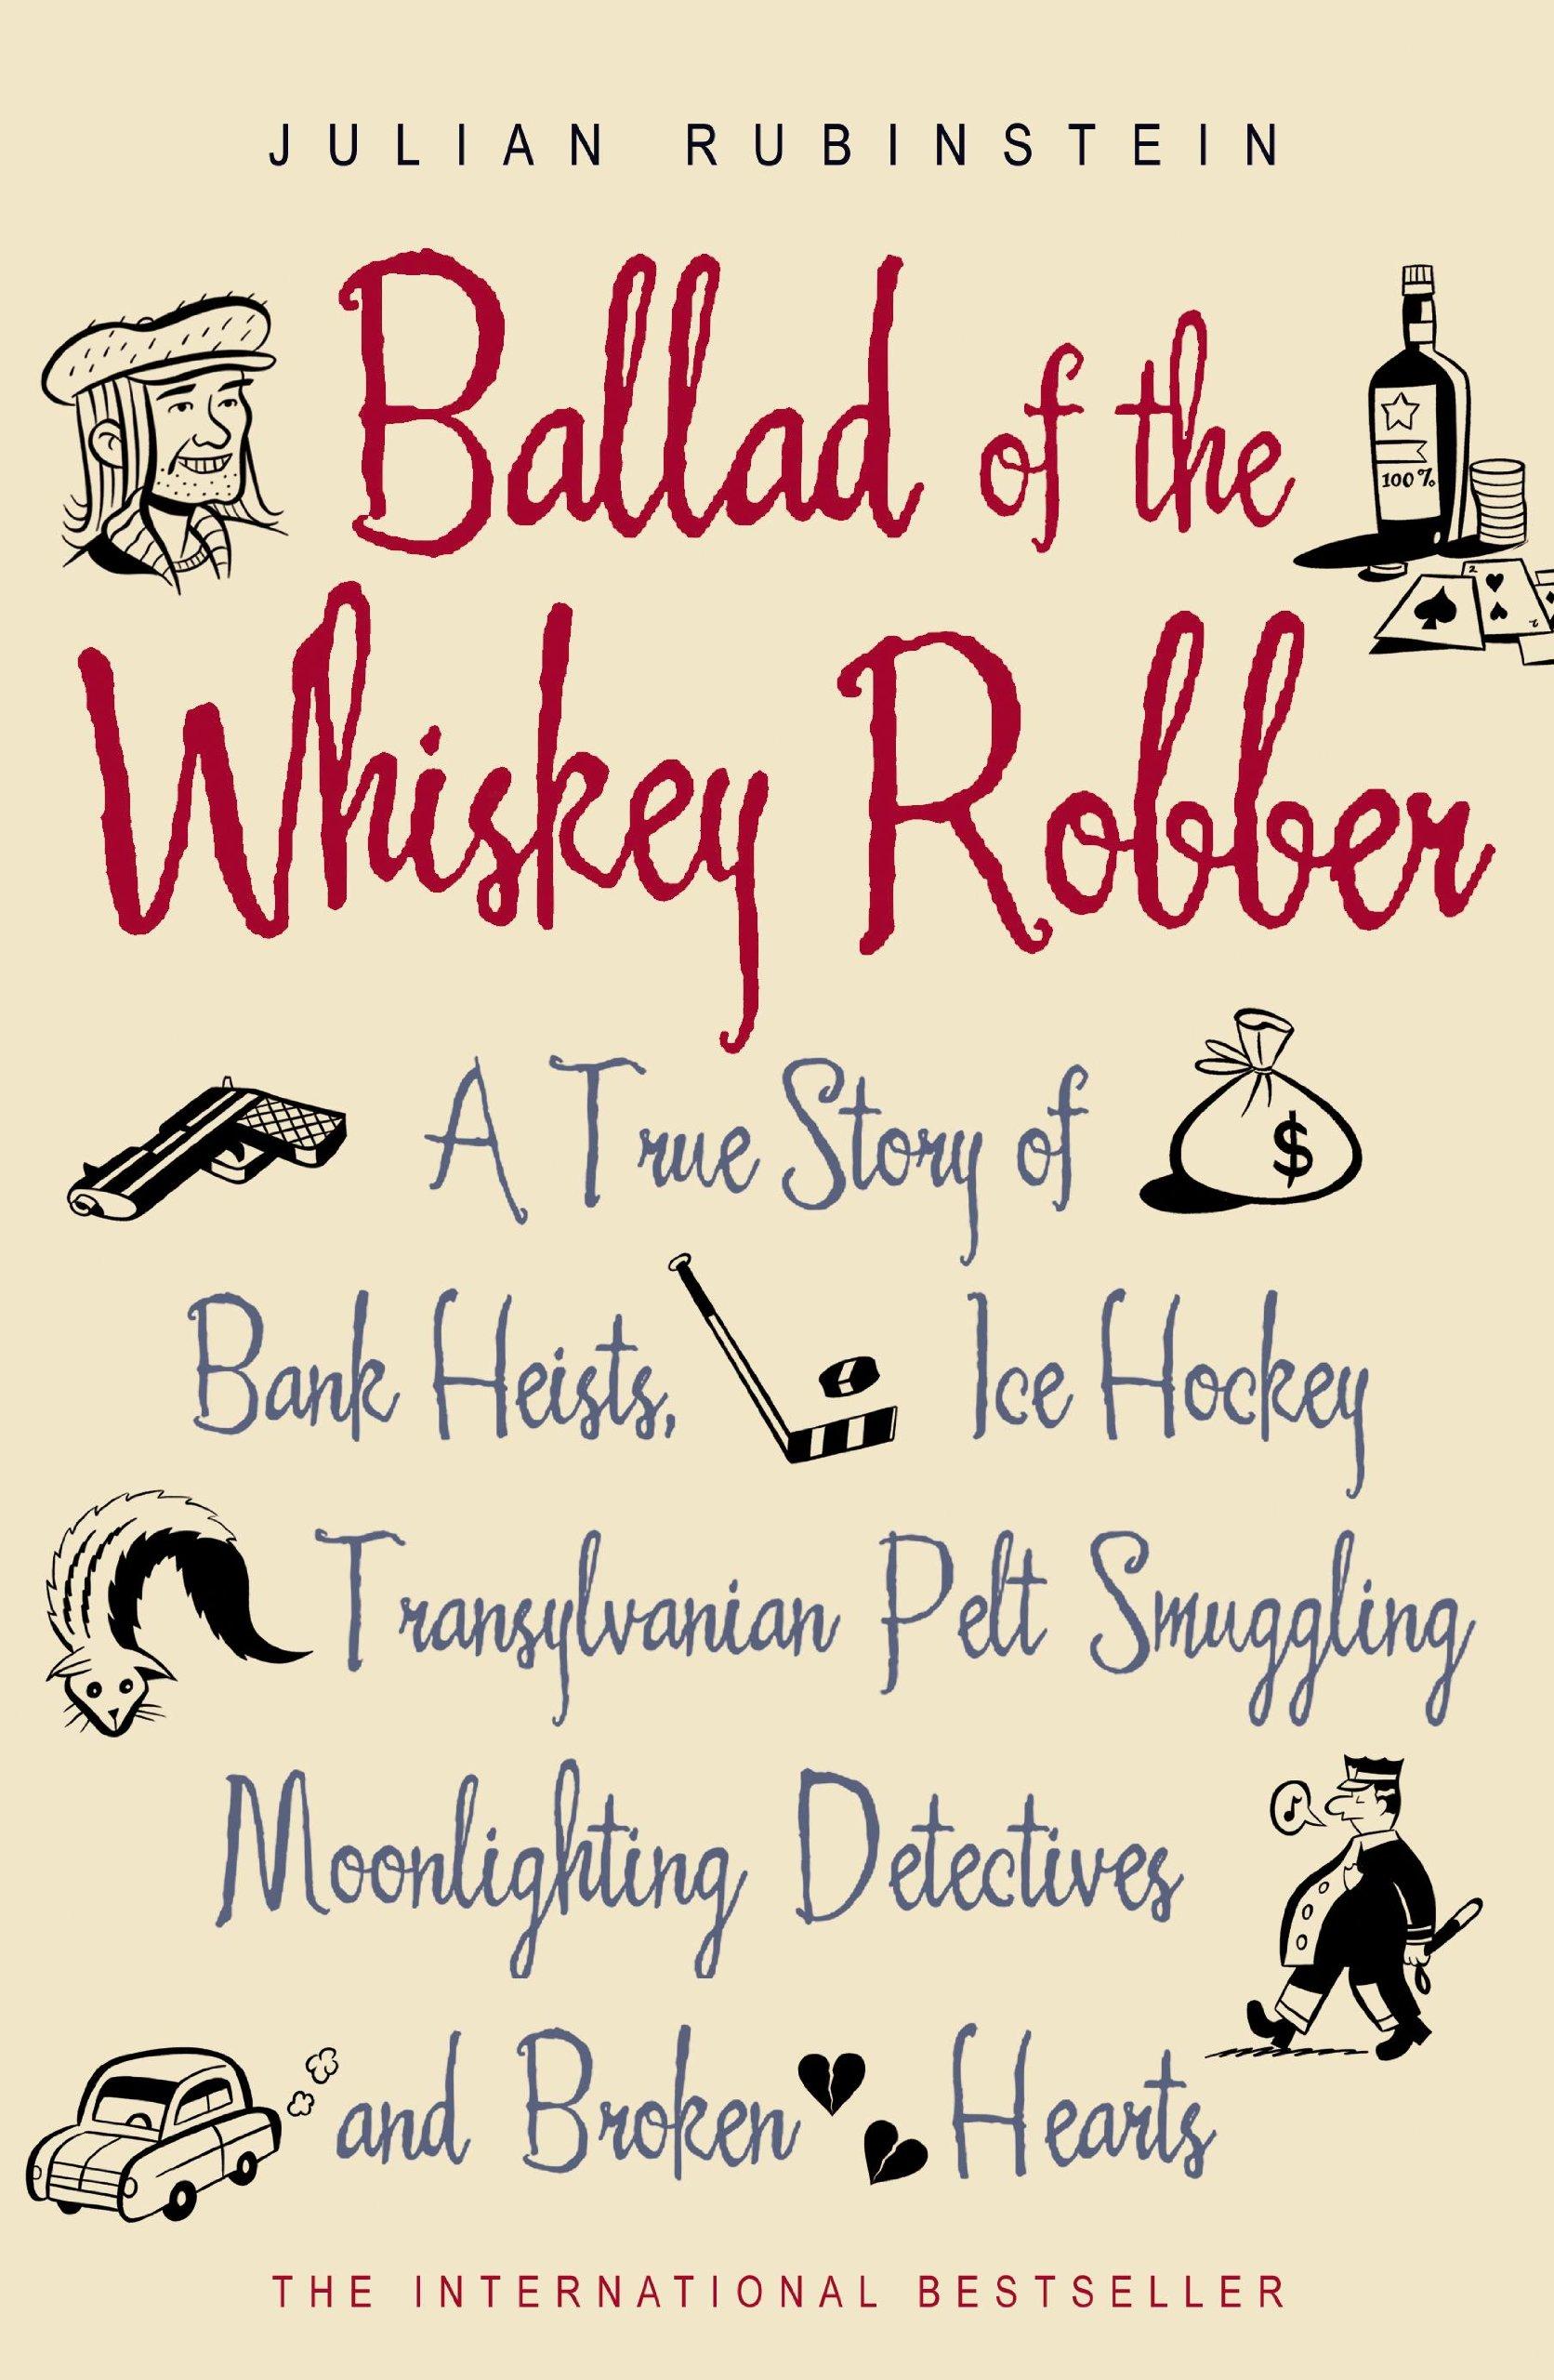 Ballad Whiskey Robber Transylvanian Smuggling